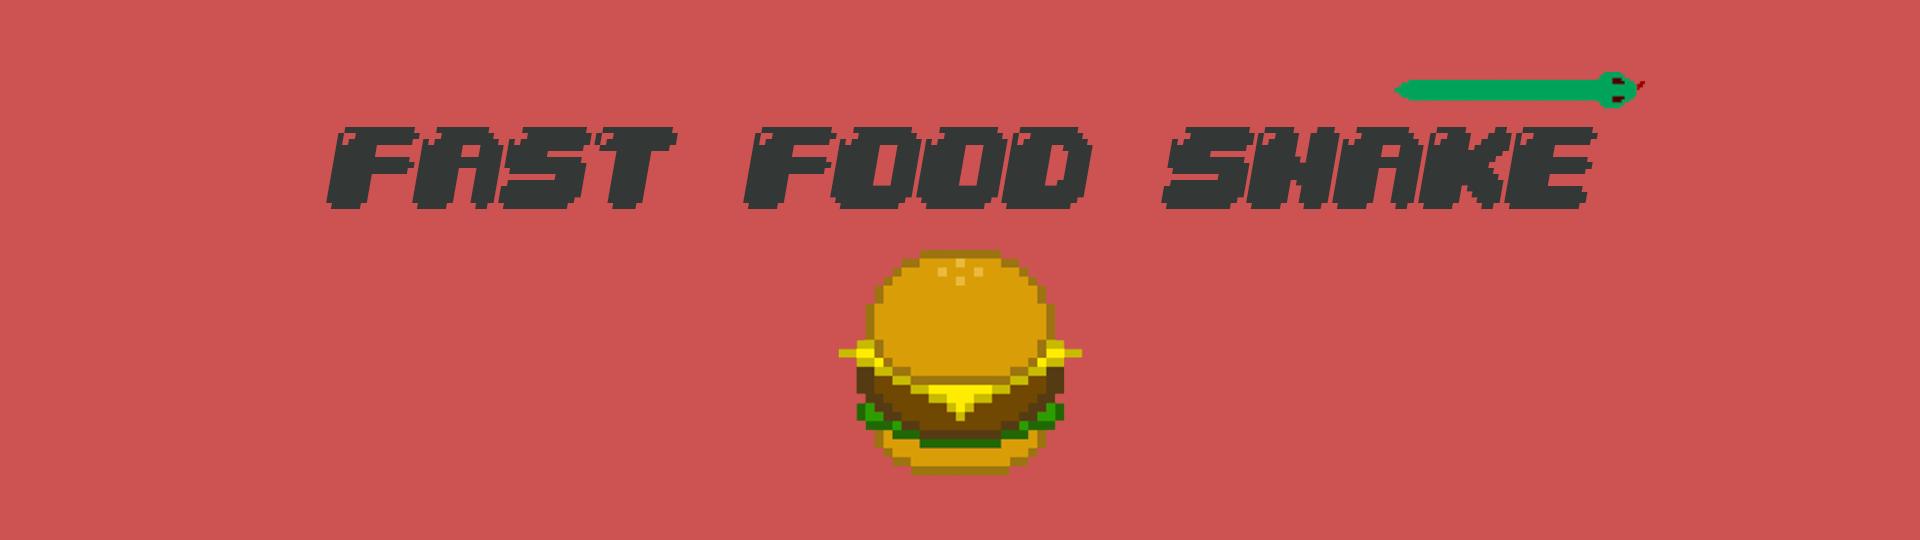 Fast Food Snake